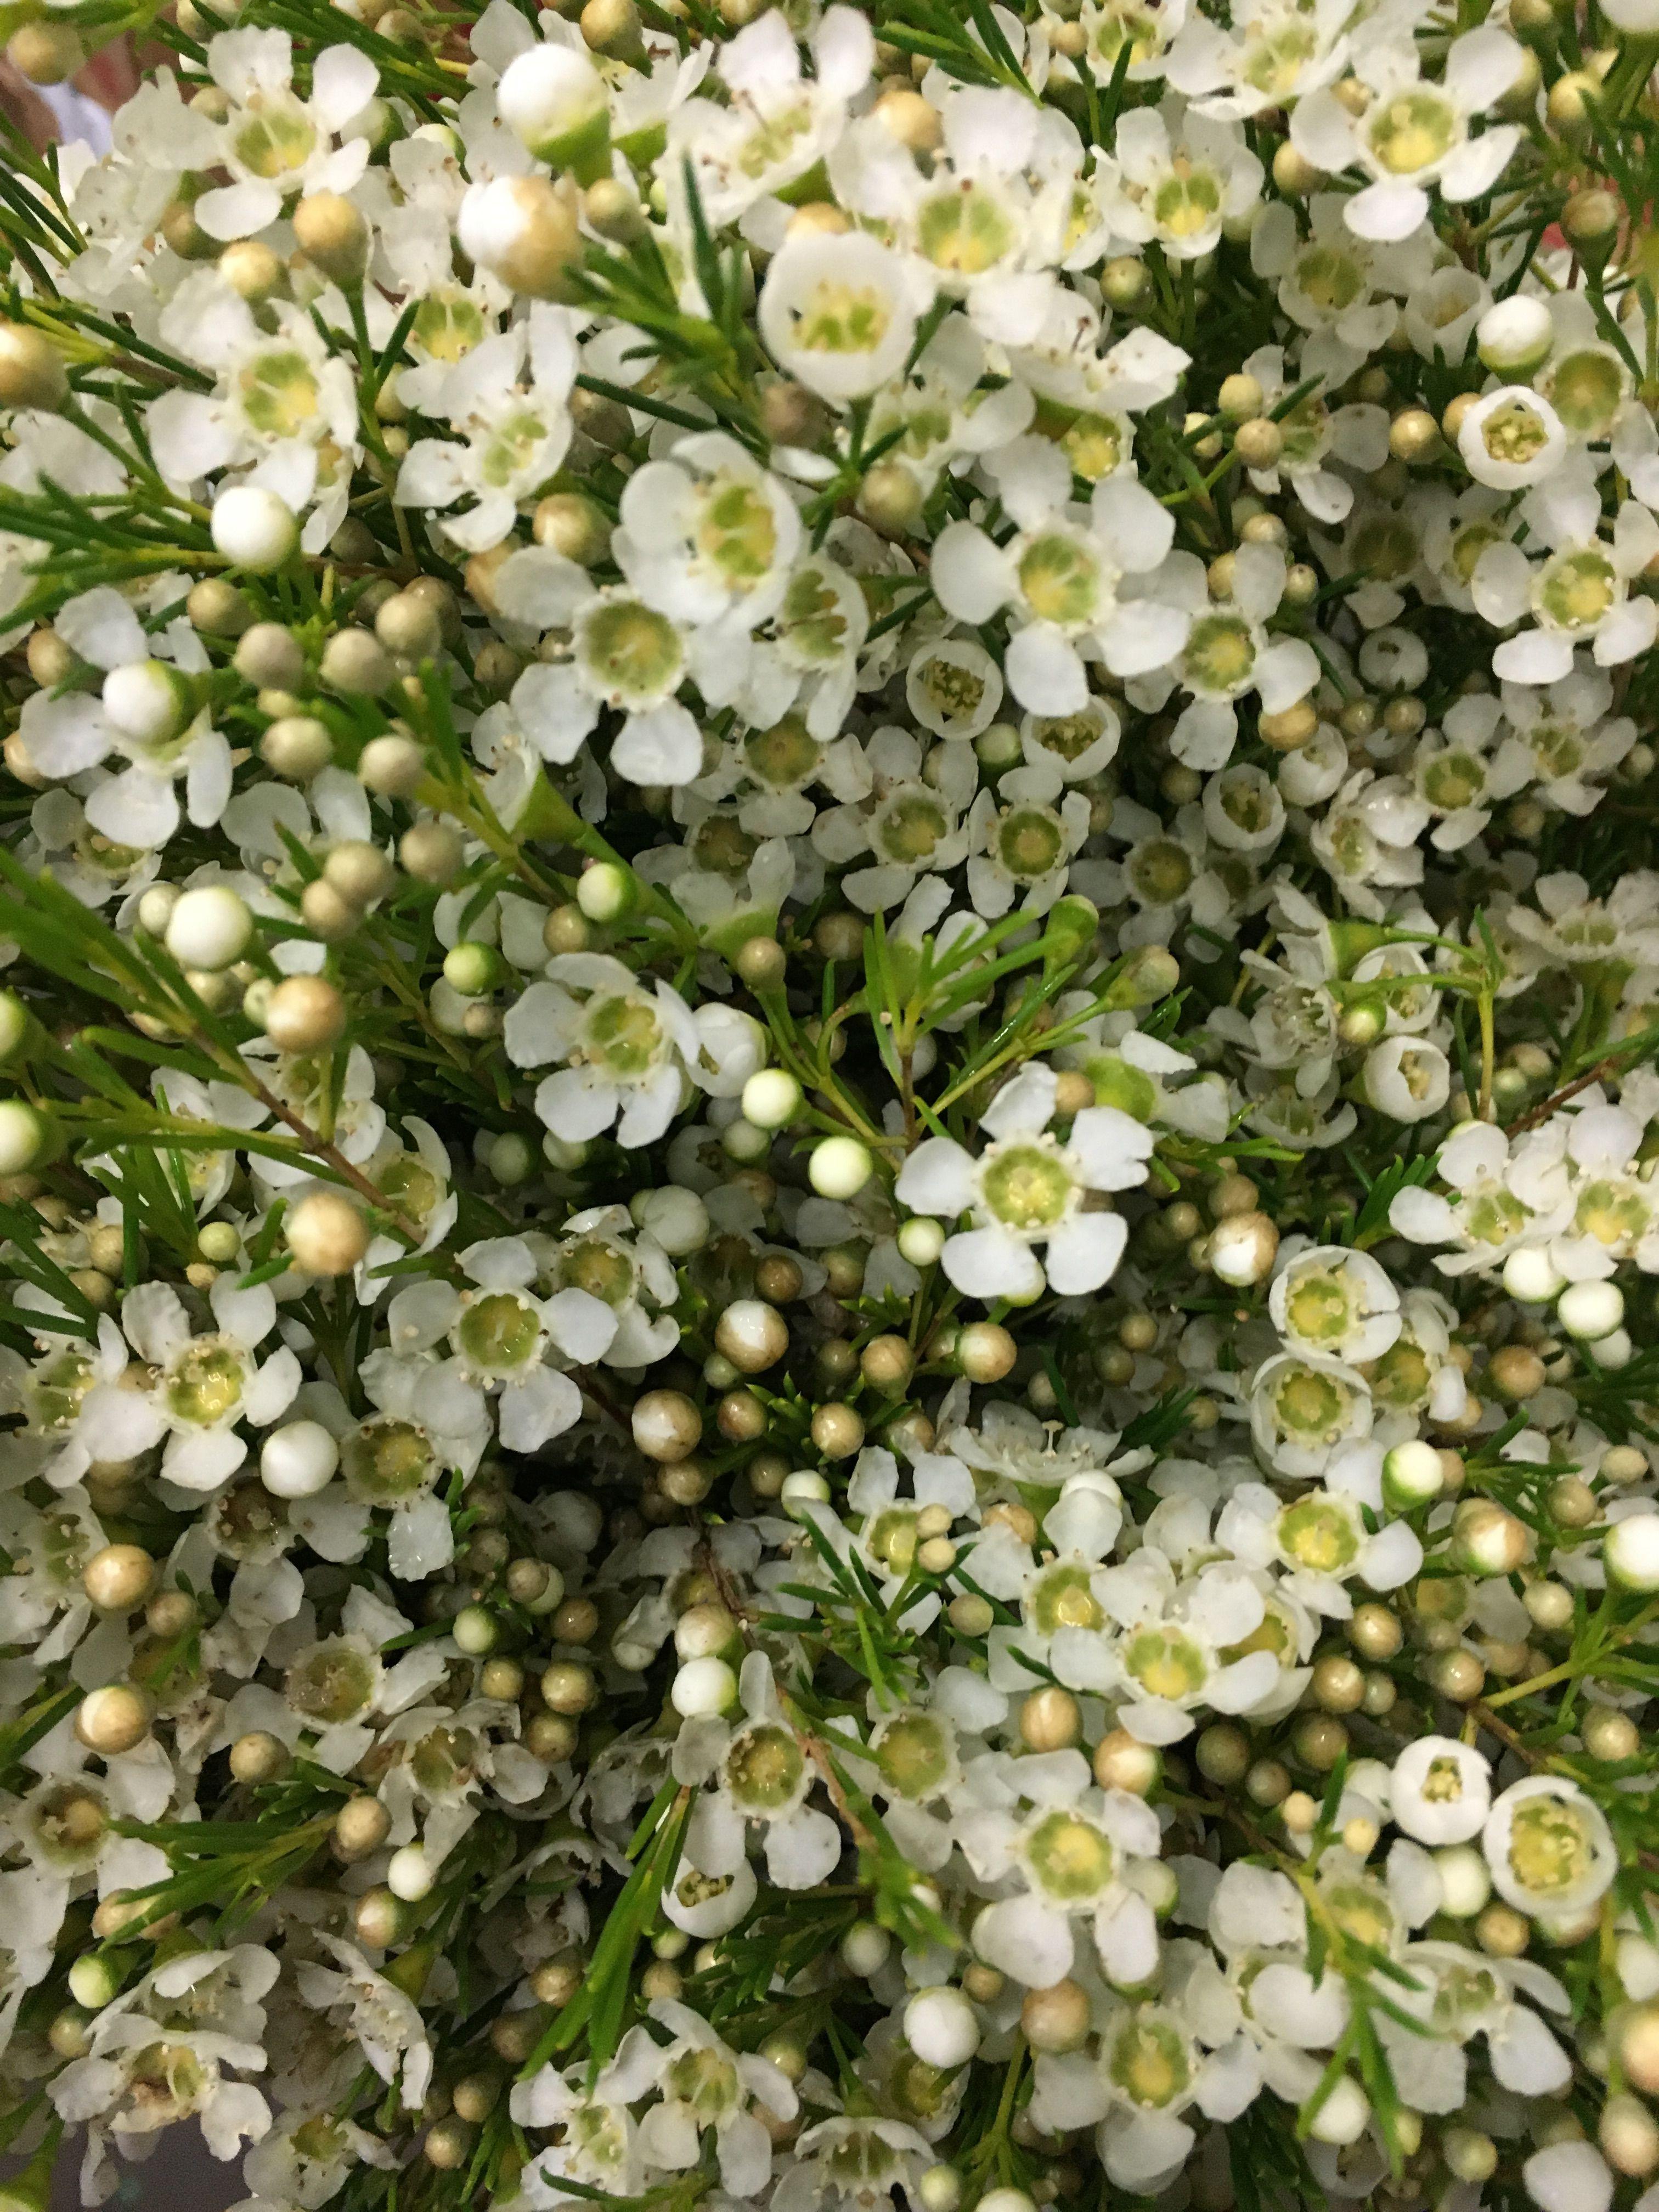 Great white wax flower gallery wedding and flowers ispiration alba white wax flower white flowers pinterest wax flowers mightylinksfo Choice Image